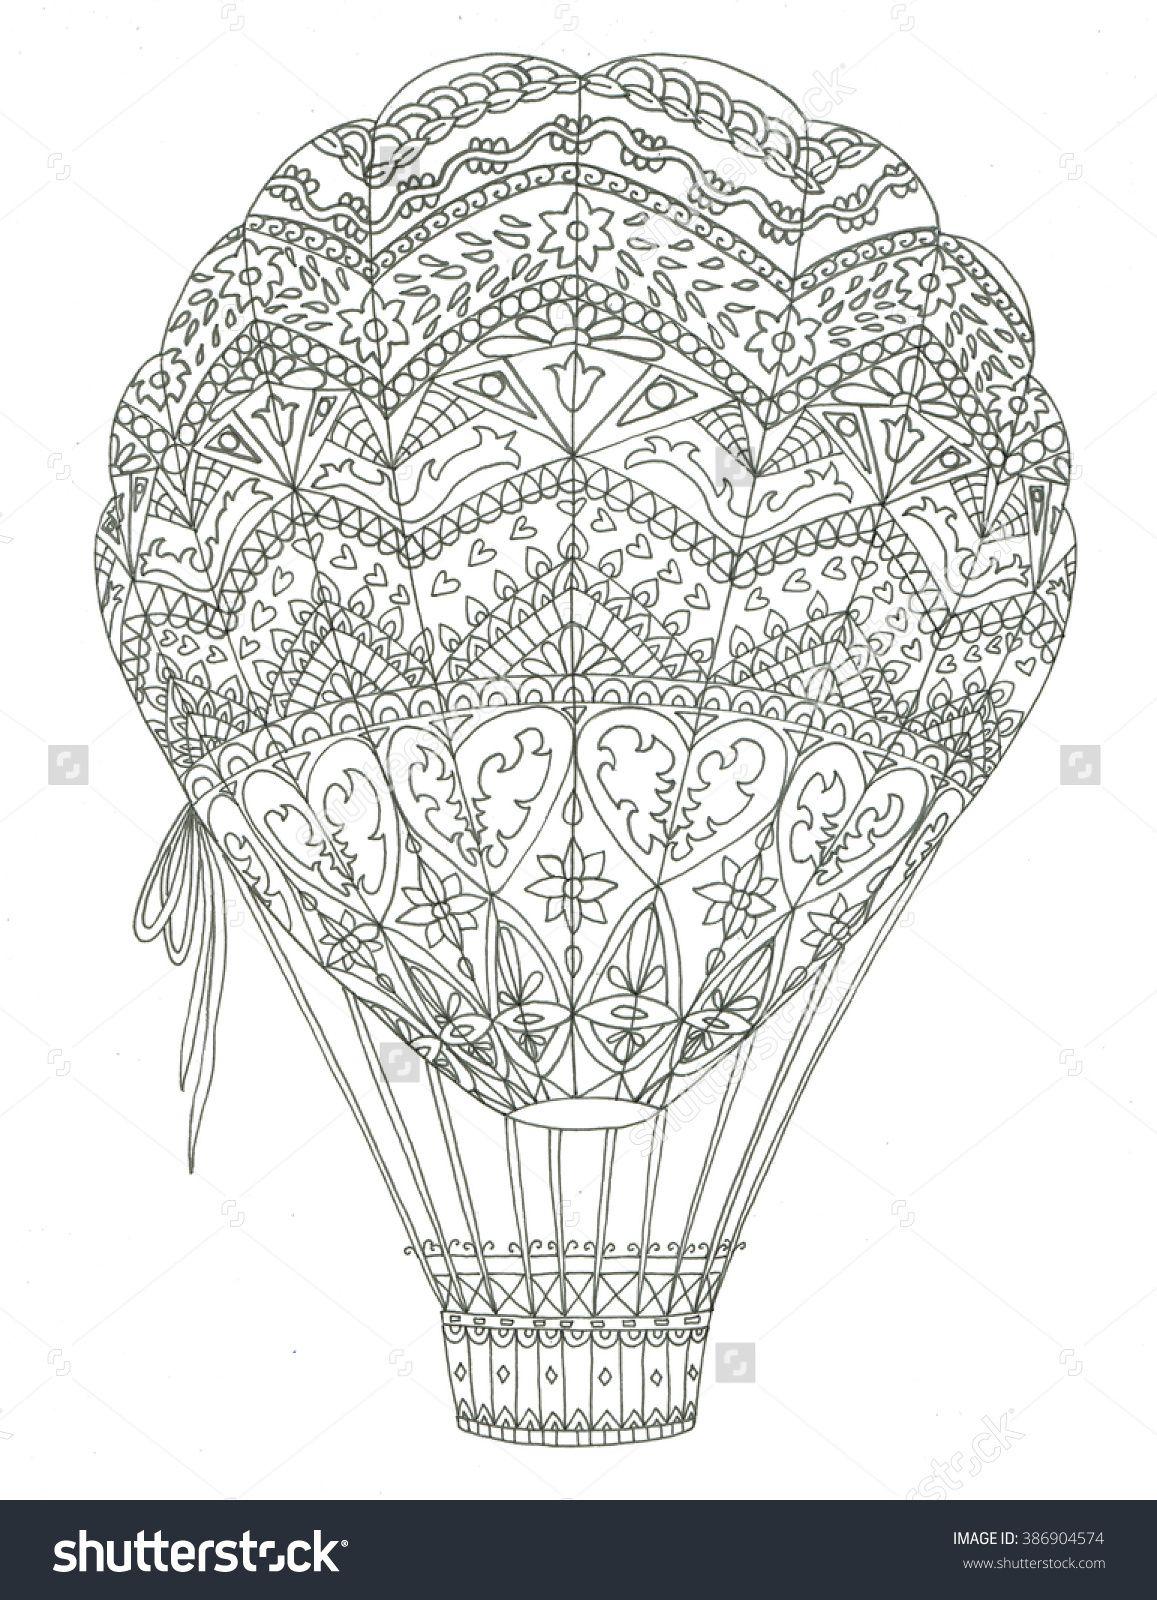 Air balloon coloring page | Color | Pinterest | Globo y Mandalas